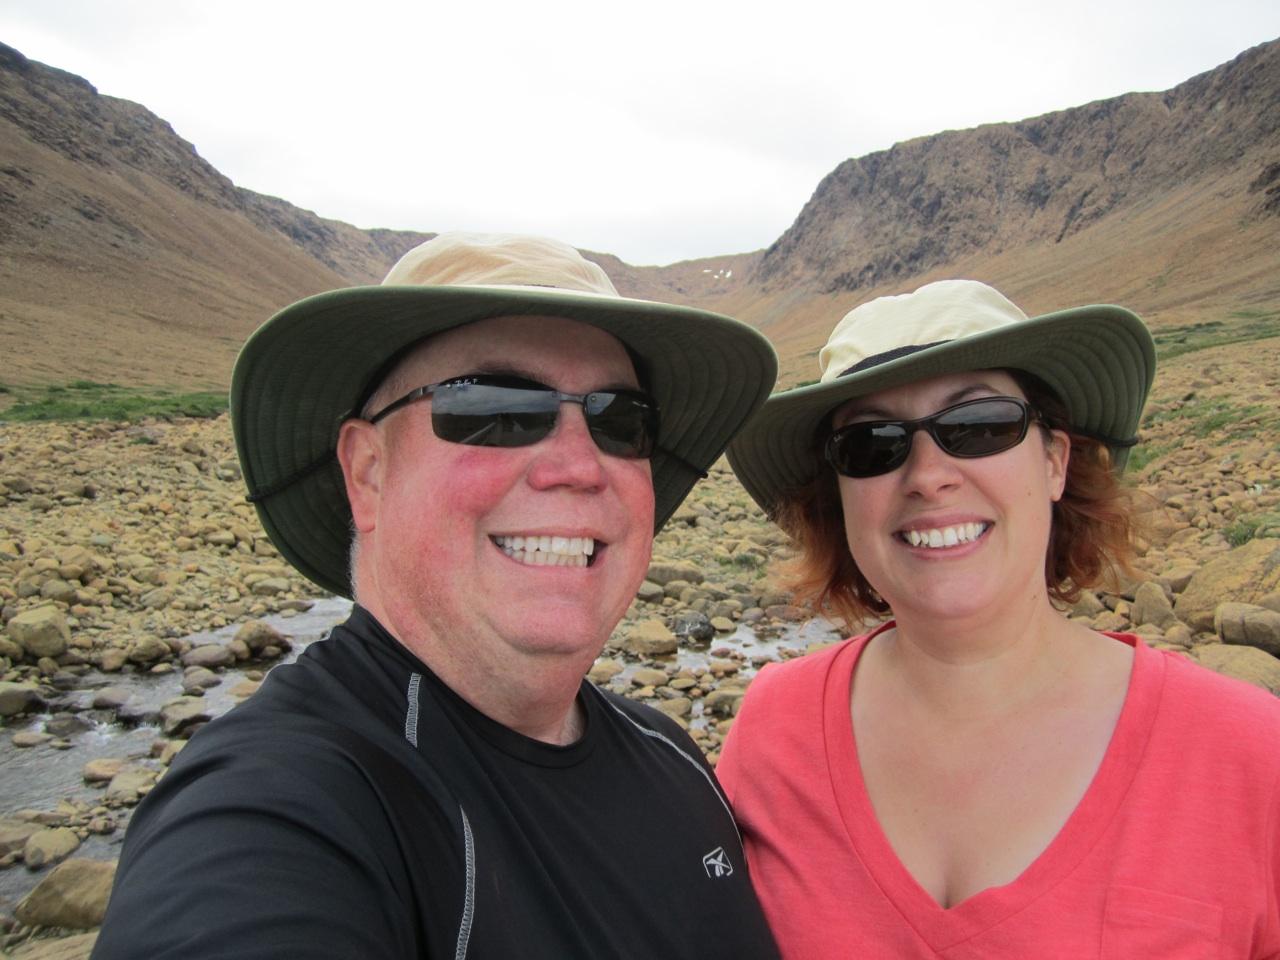 David & Brenda Hiking The Tablelands Trail